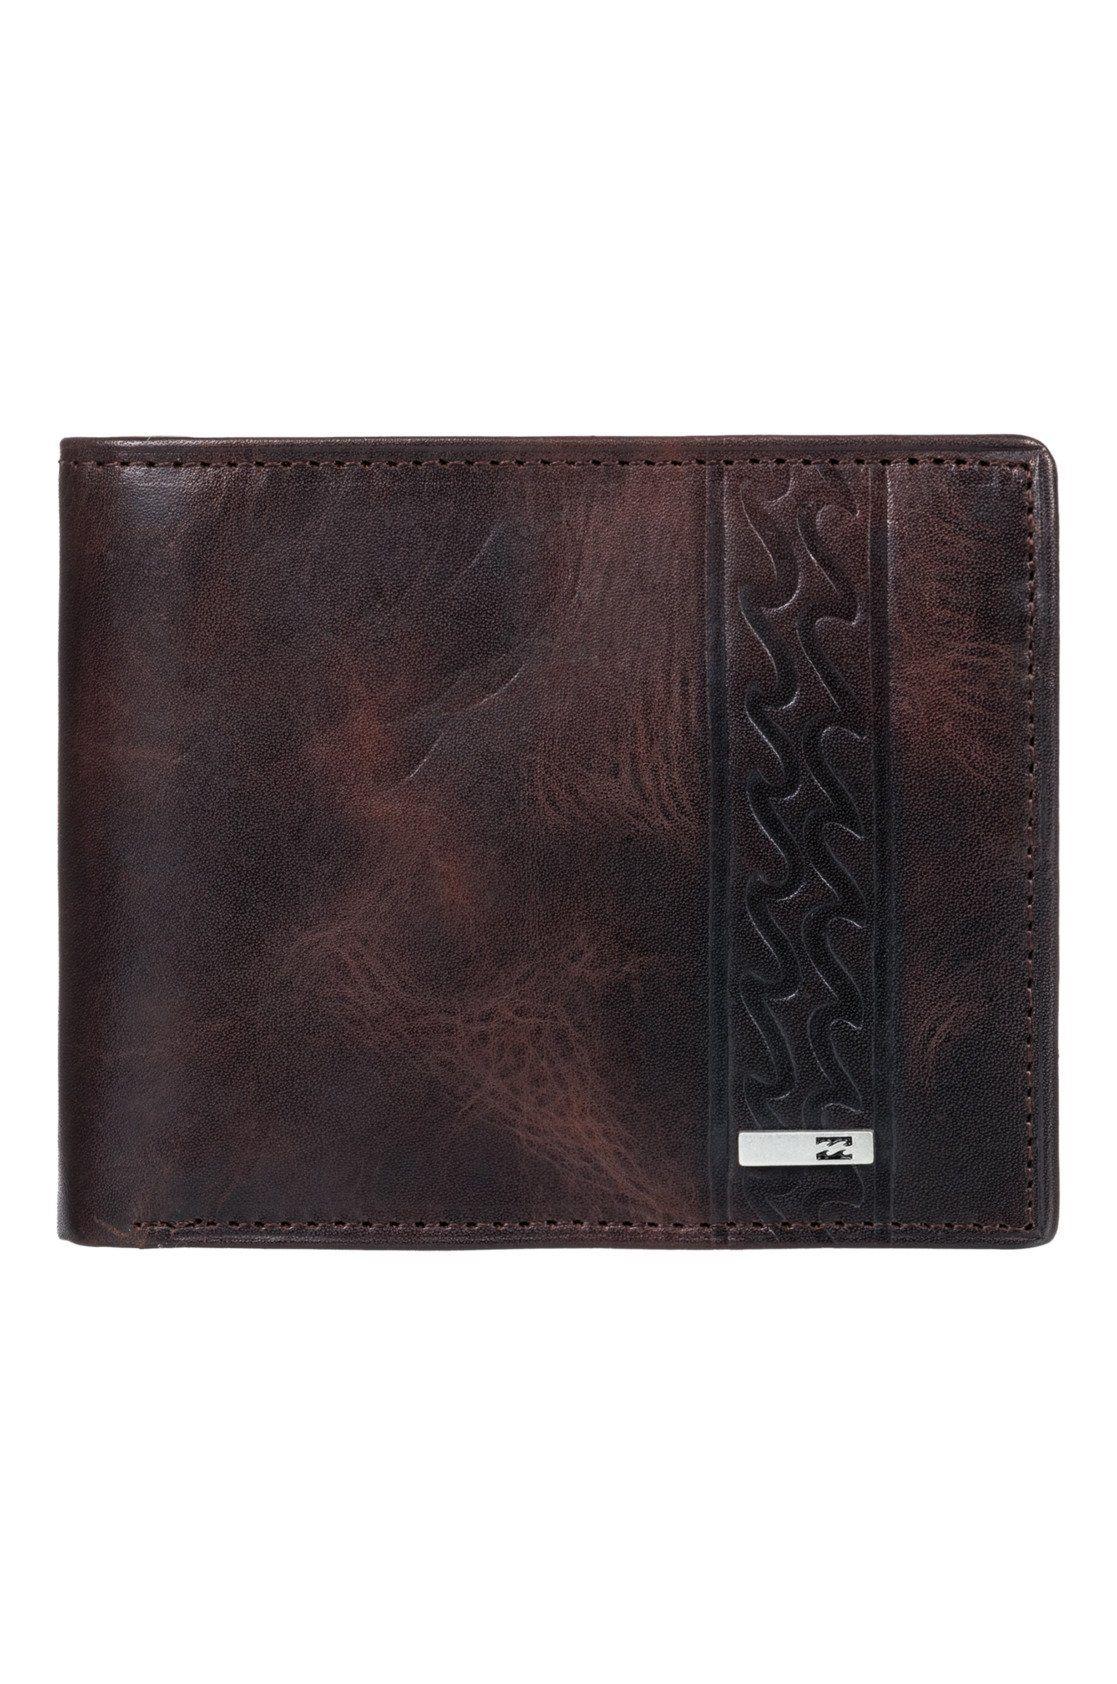 Billabong Leather Wallet DBAH Chocolate